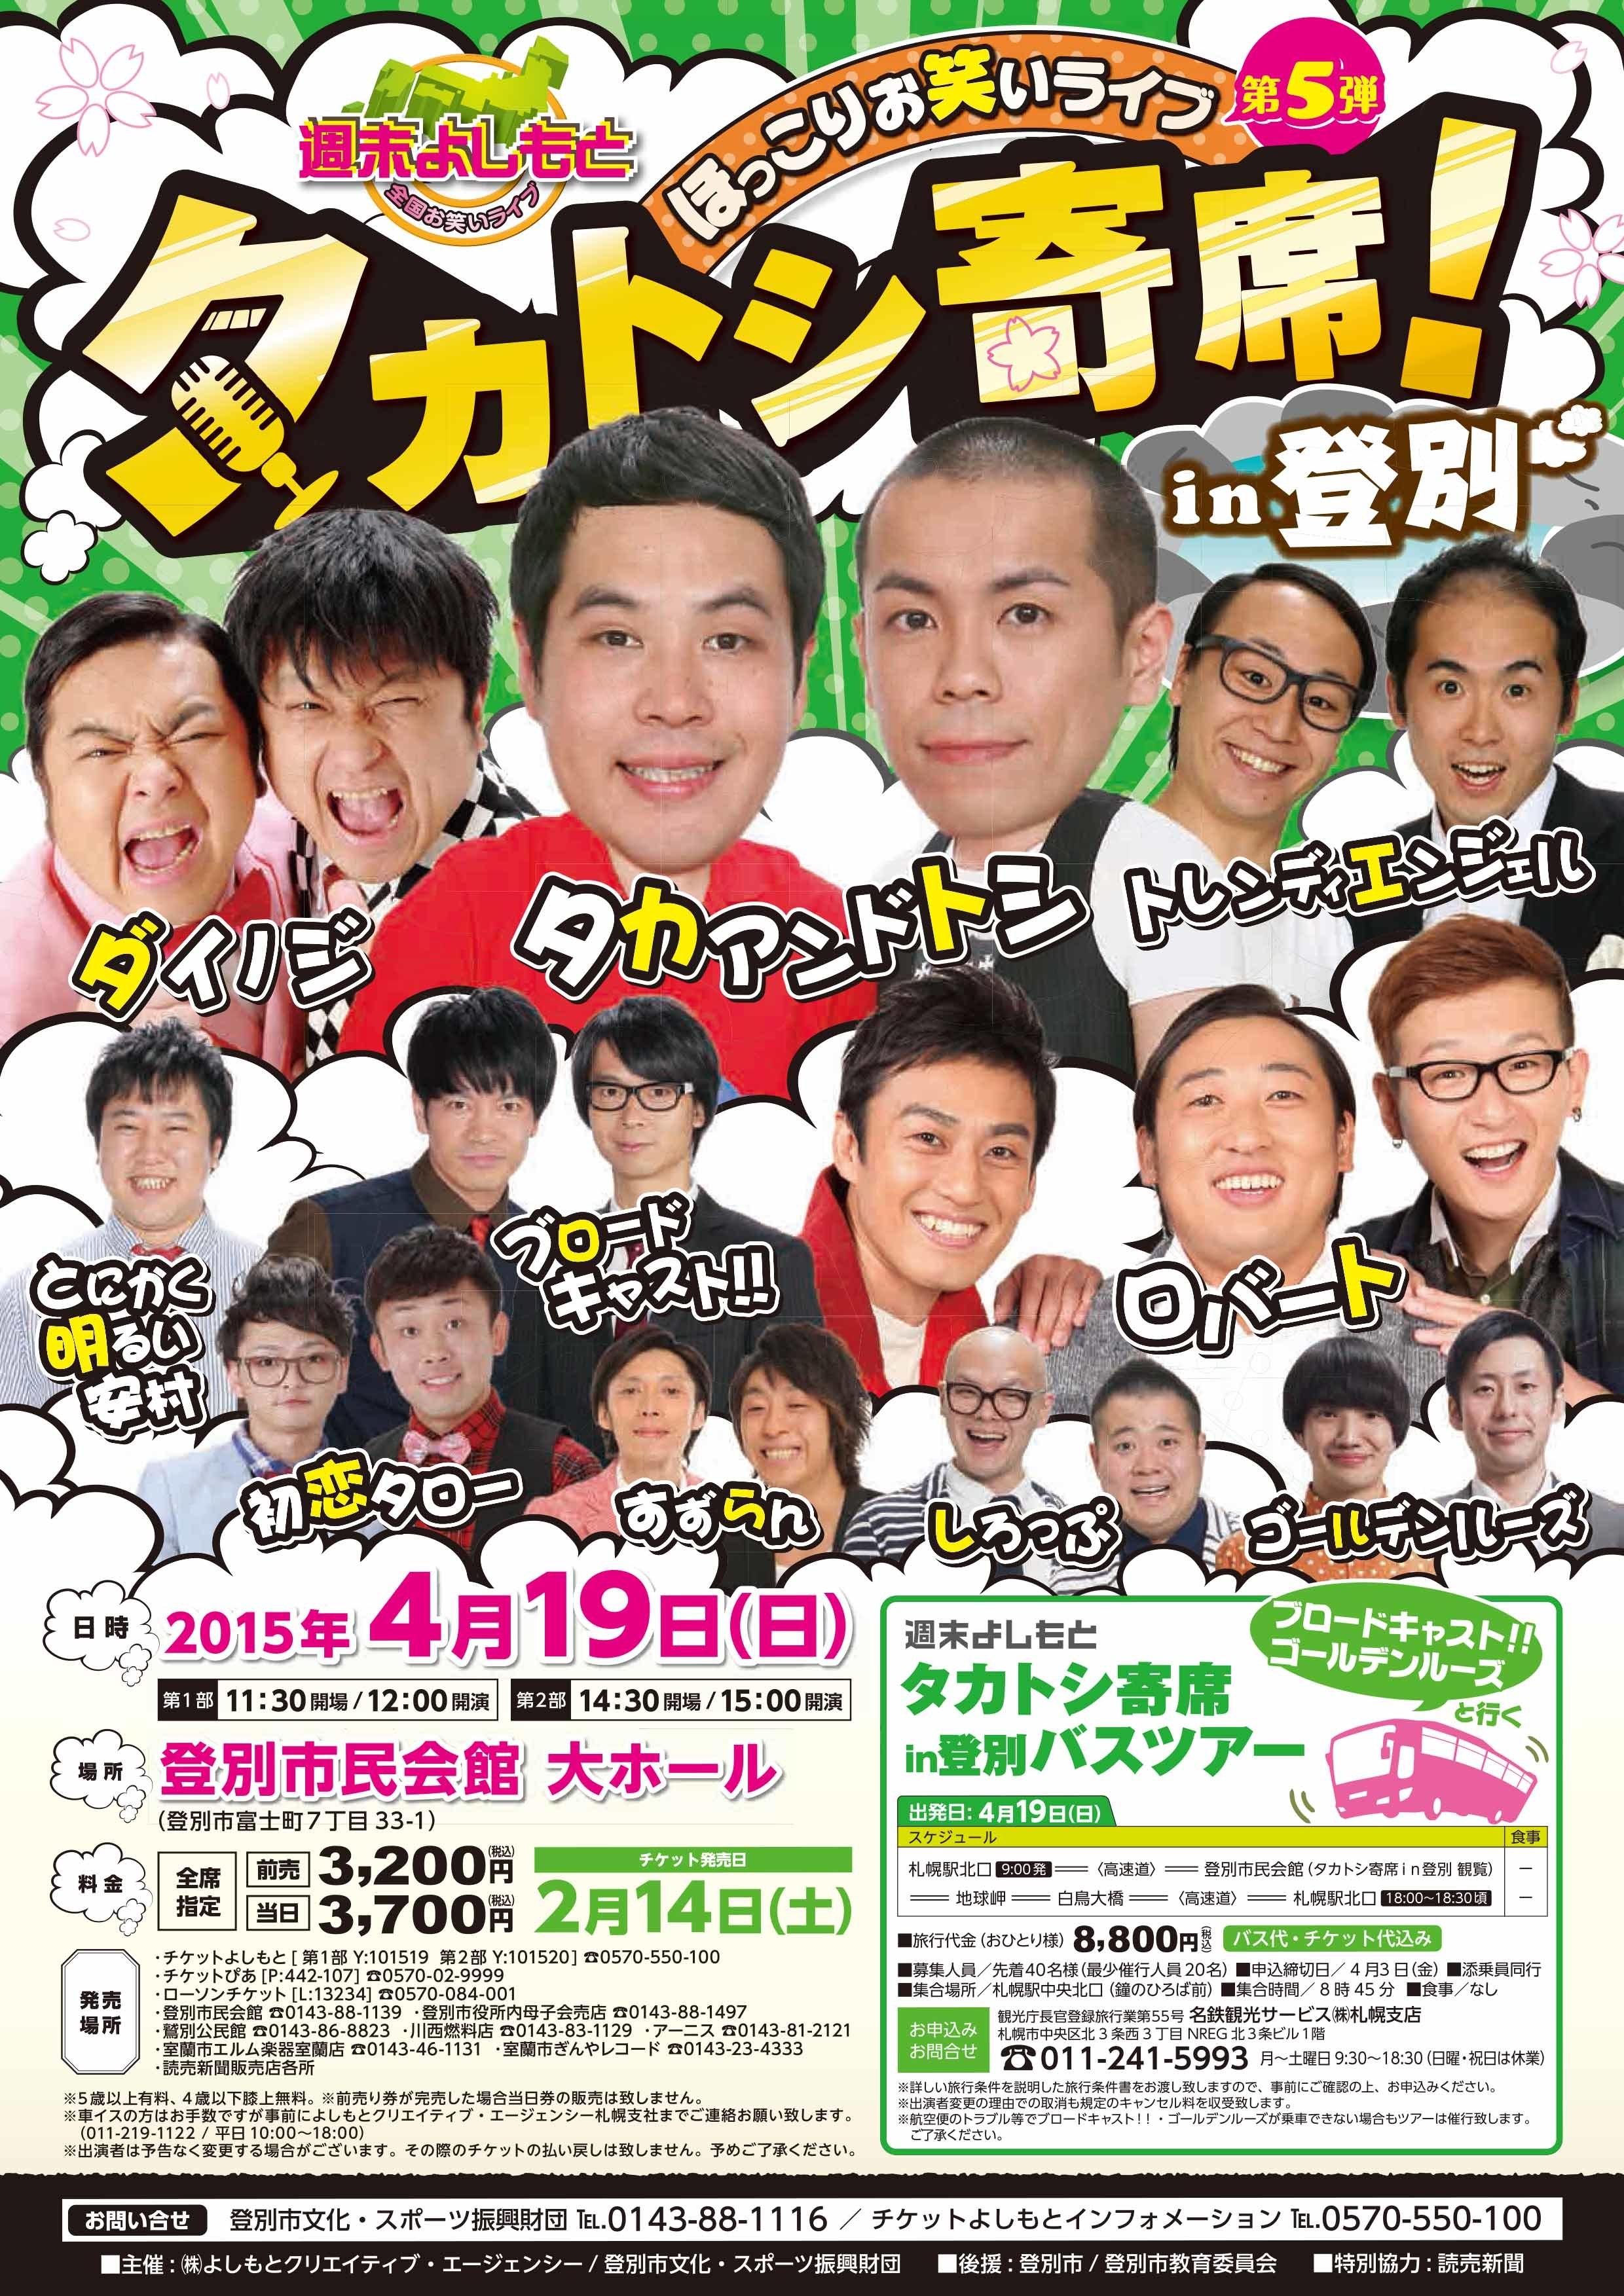 http://www.syumatsu.jp/photos/uncategorized/2015/02/23/20150223113339-11a2e67484db3b214748dbd7eb826241bb506095.jpg